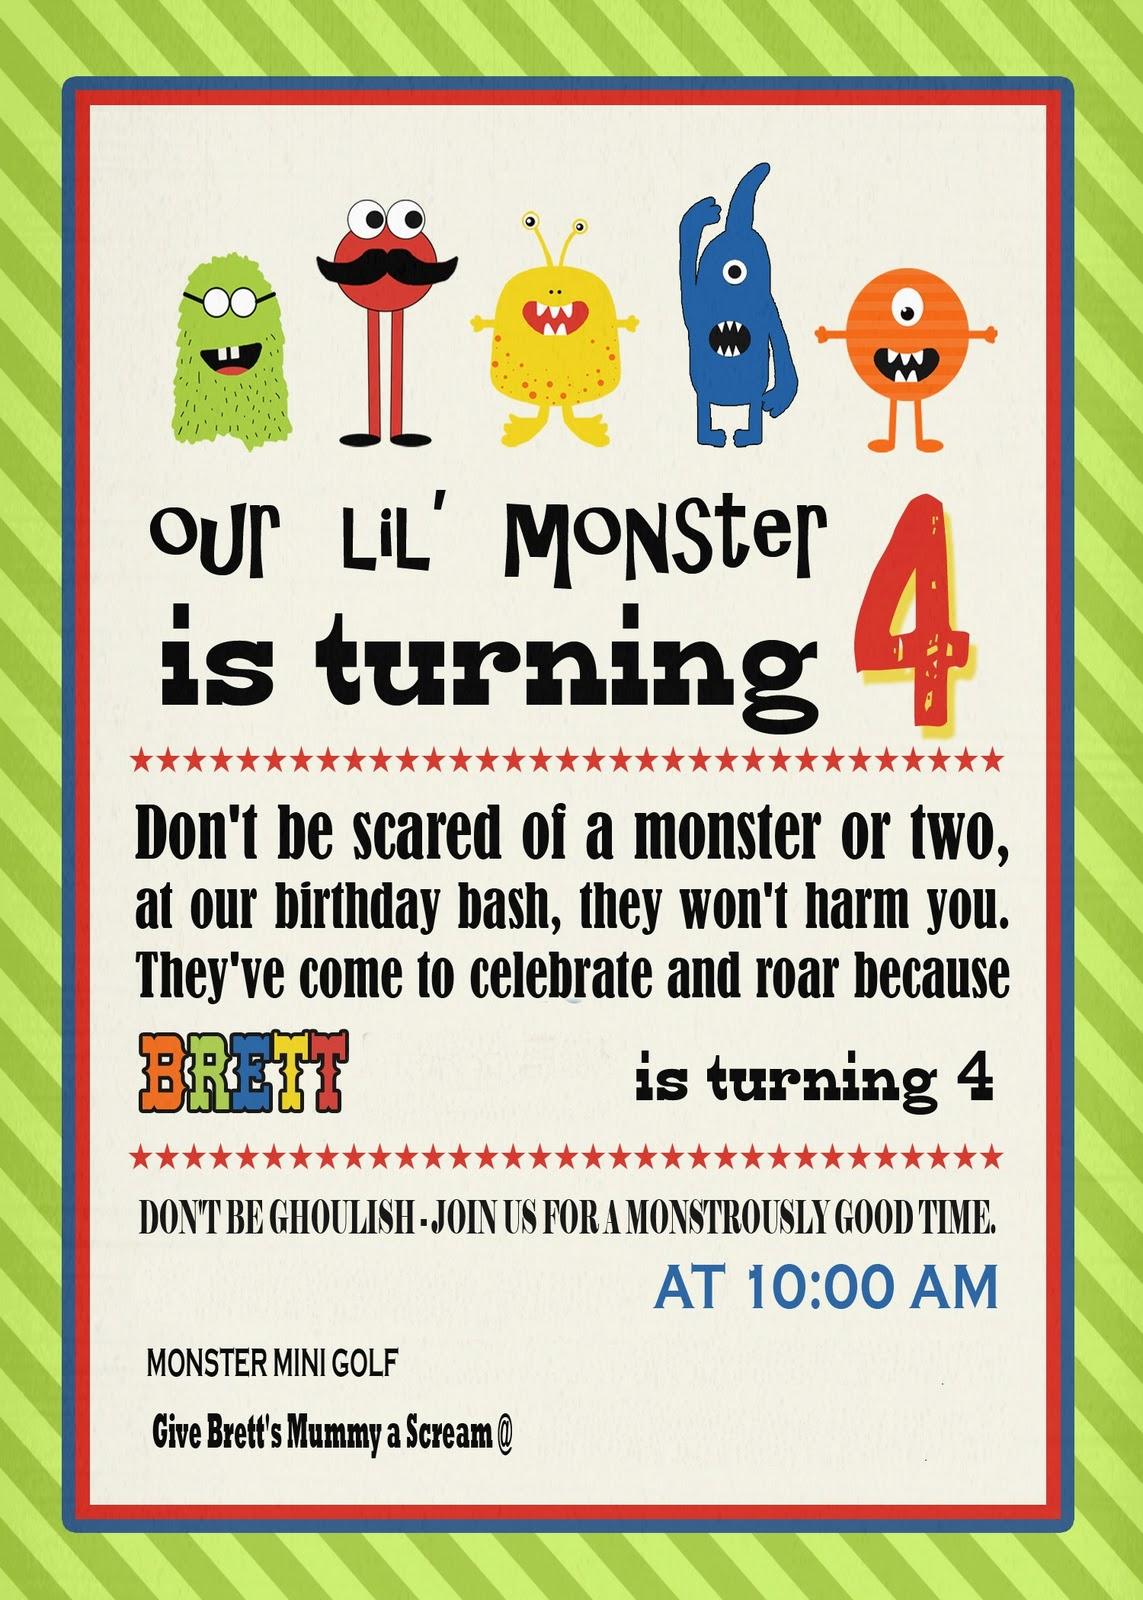 CutCopy Paste Monster Birthday Party – Mini Golf Birthday Party Invitations